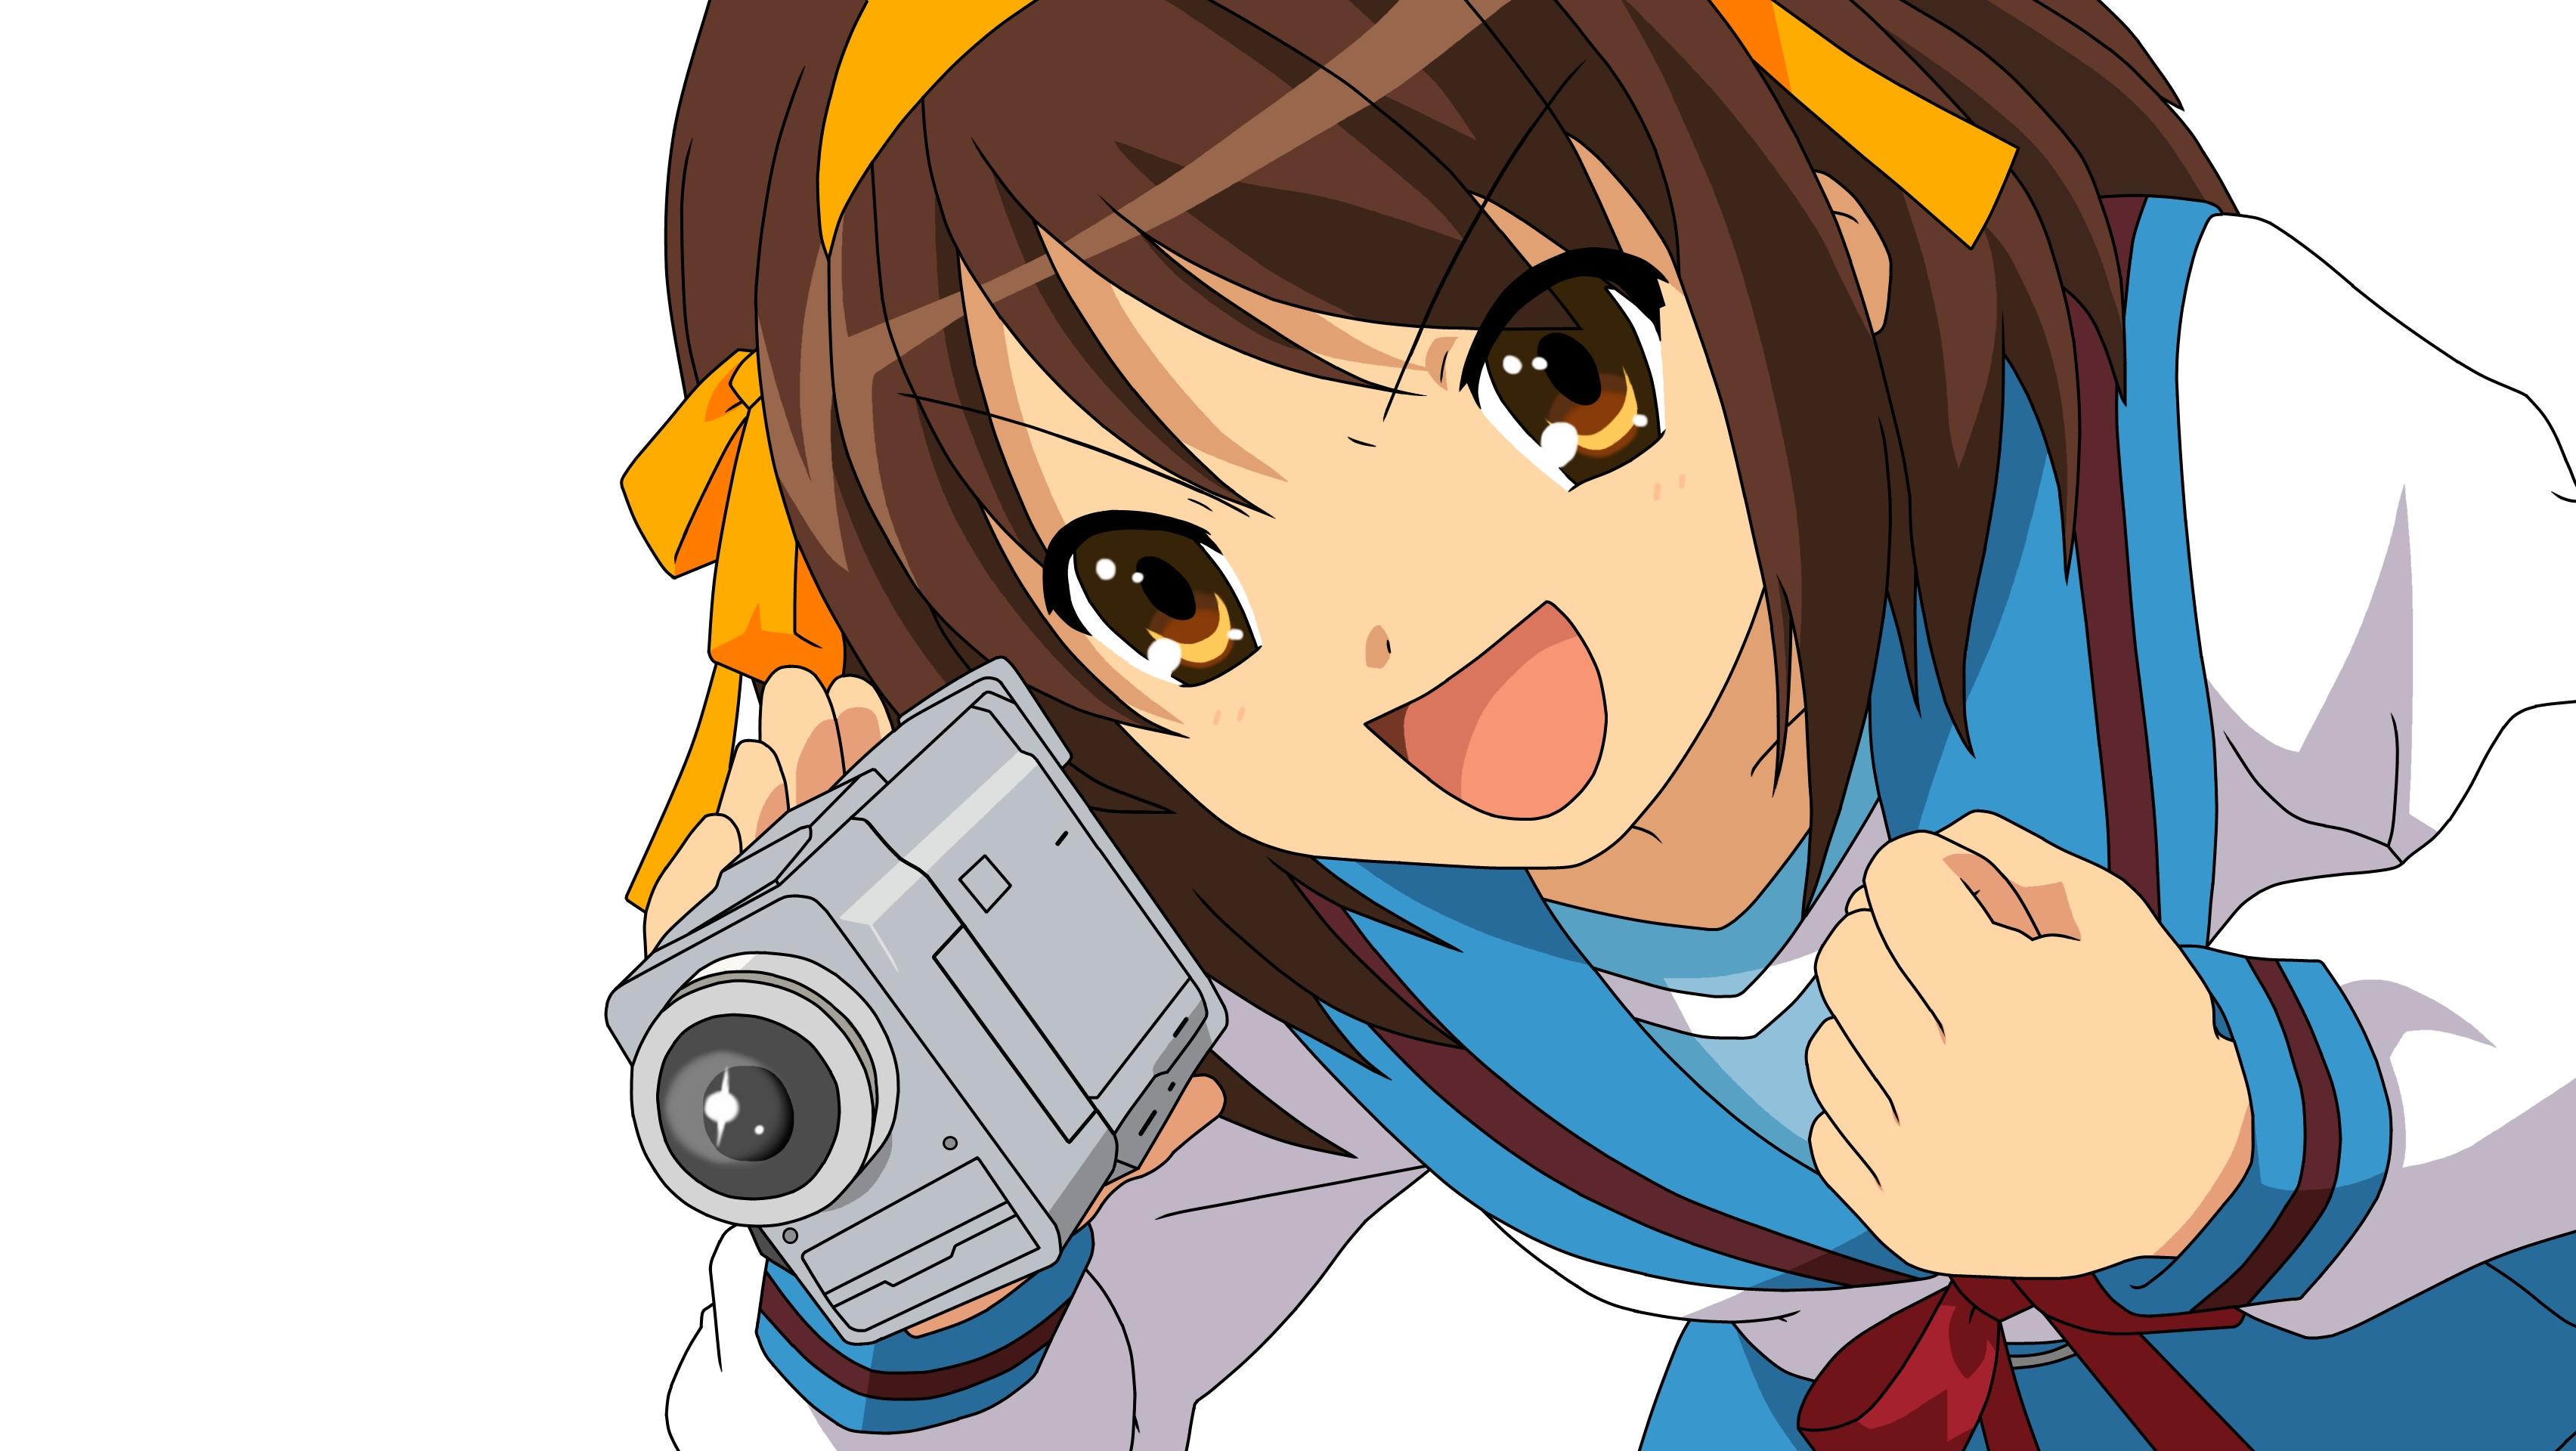 The Melancholy Of Haruhi Suzumiya Full HD Wallpaper and ...